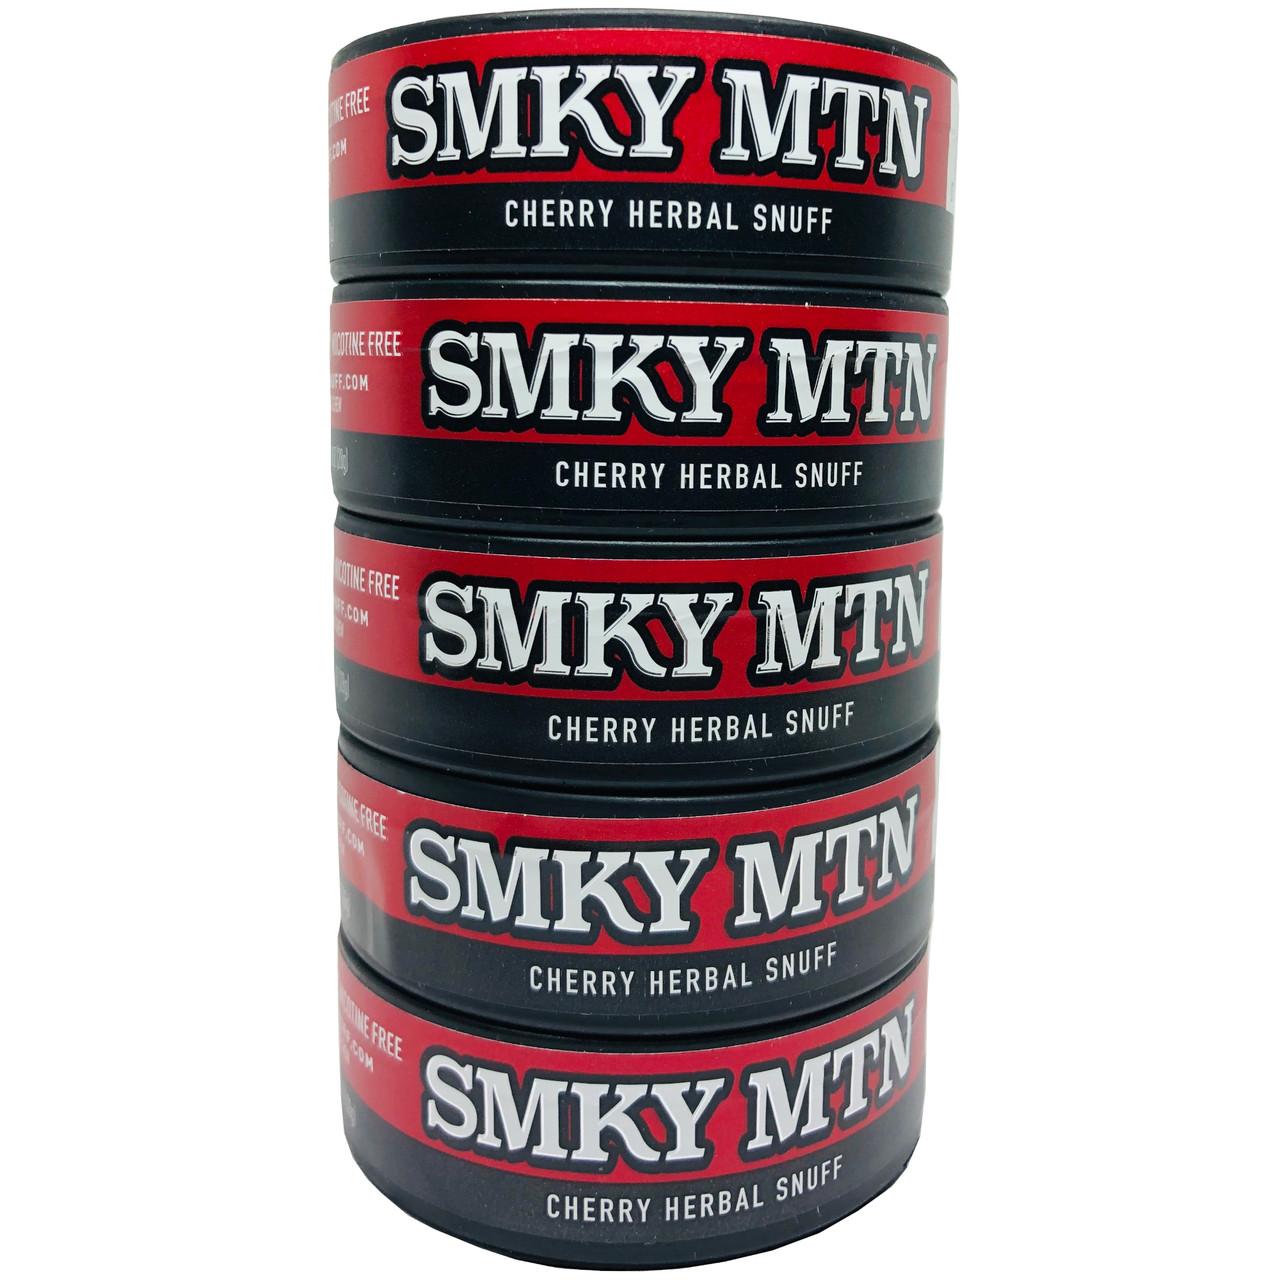 Smokey Mountain Cherry Herbal Snuff 5 Cans